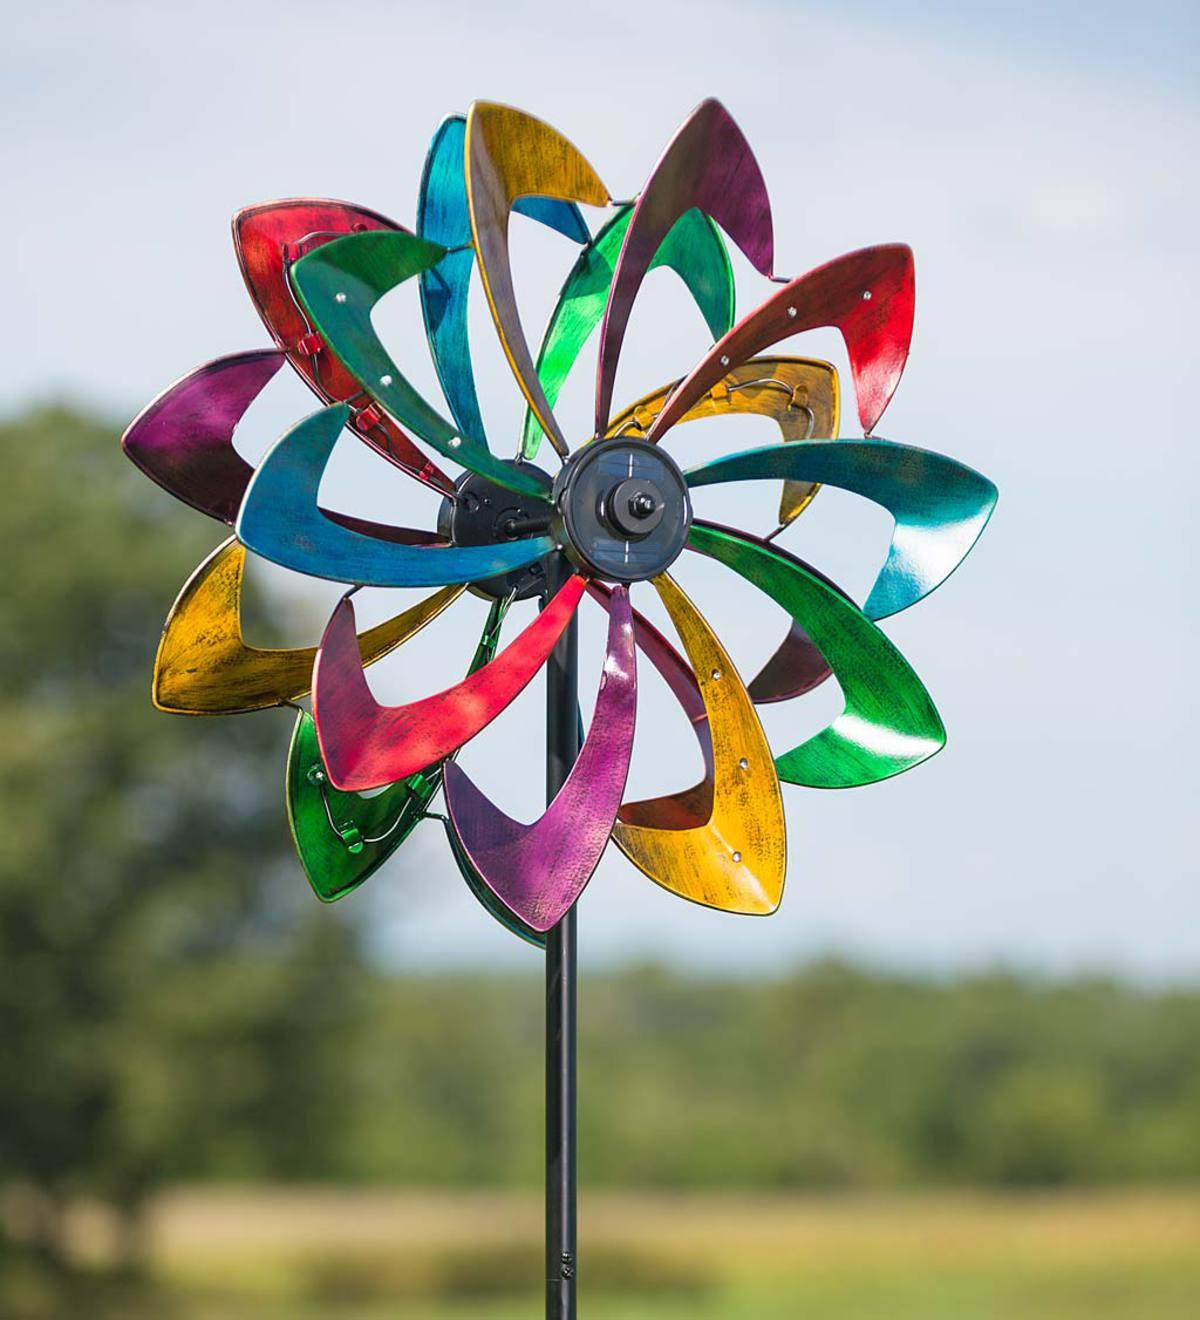 Solar Led Flower Wind Spinner Wind Spinners Plowhearth